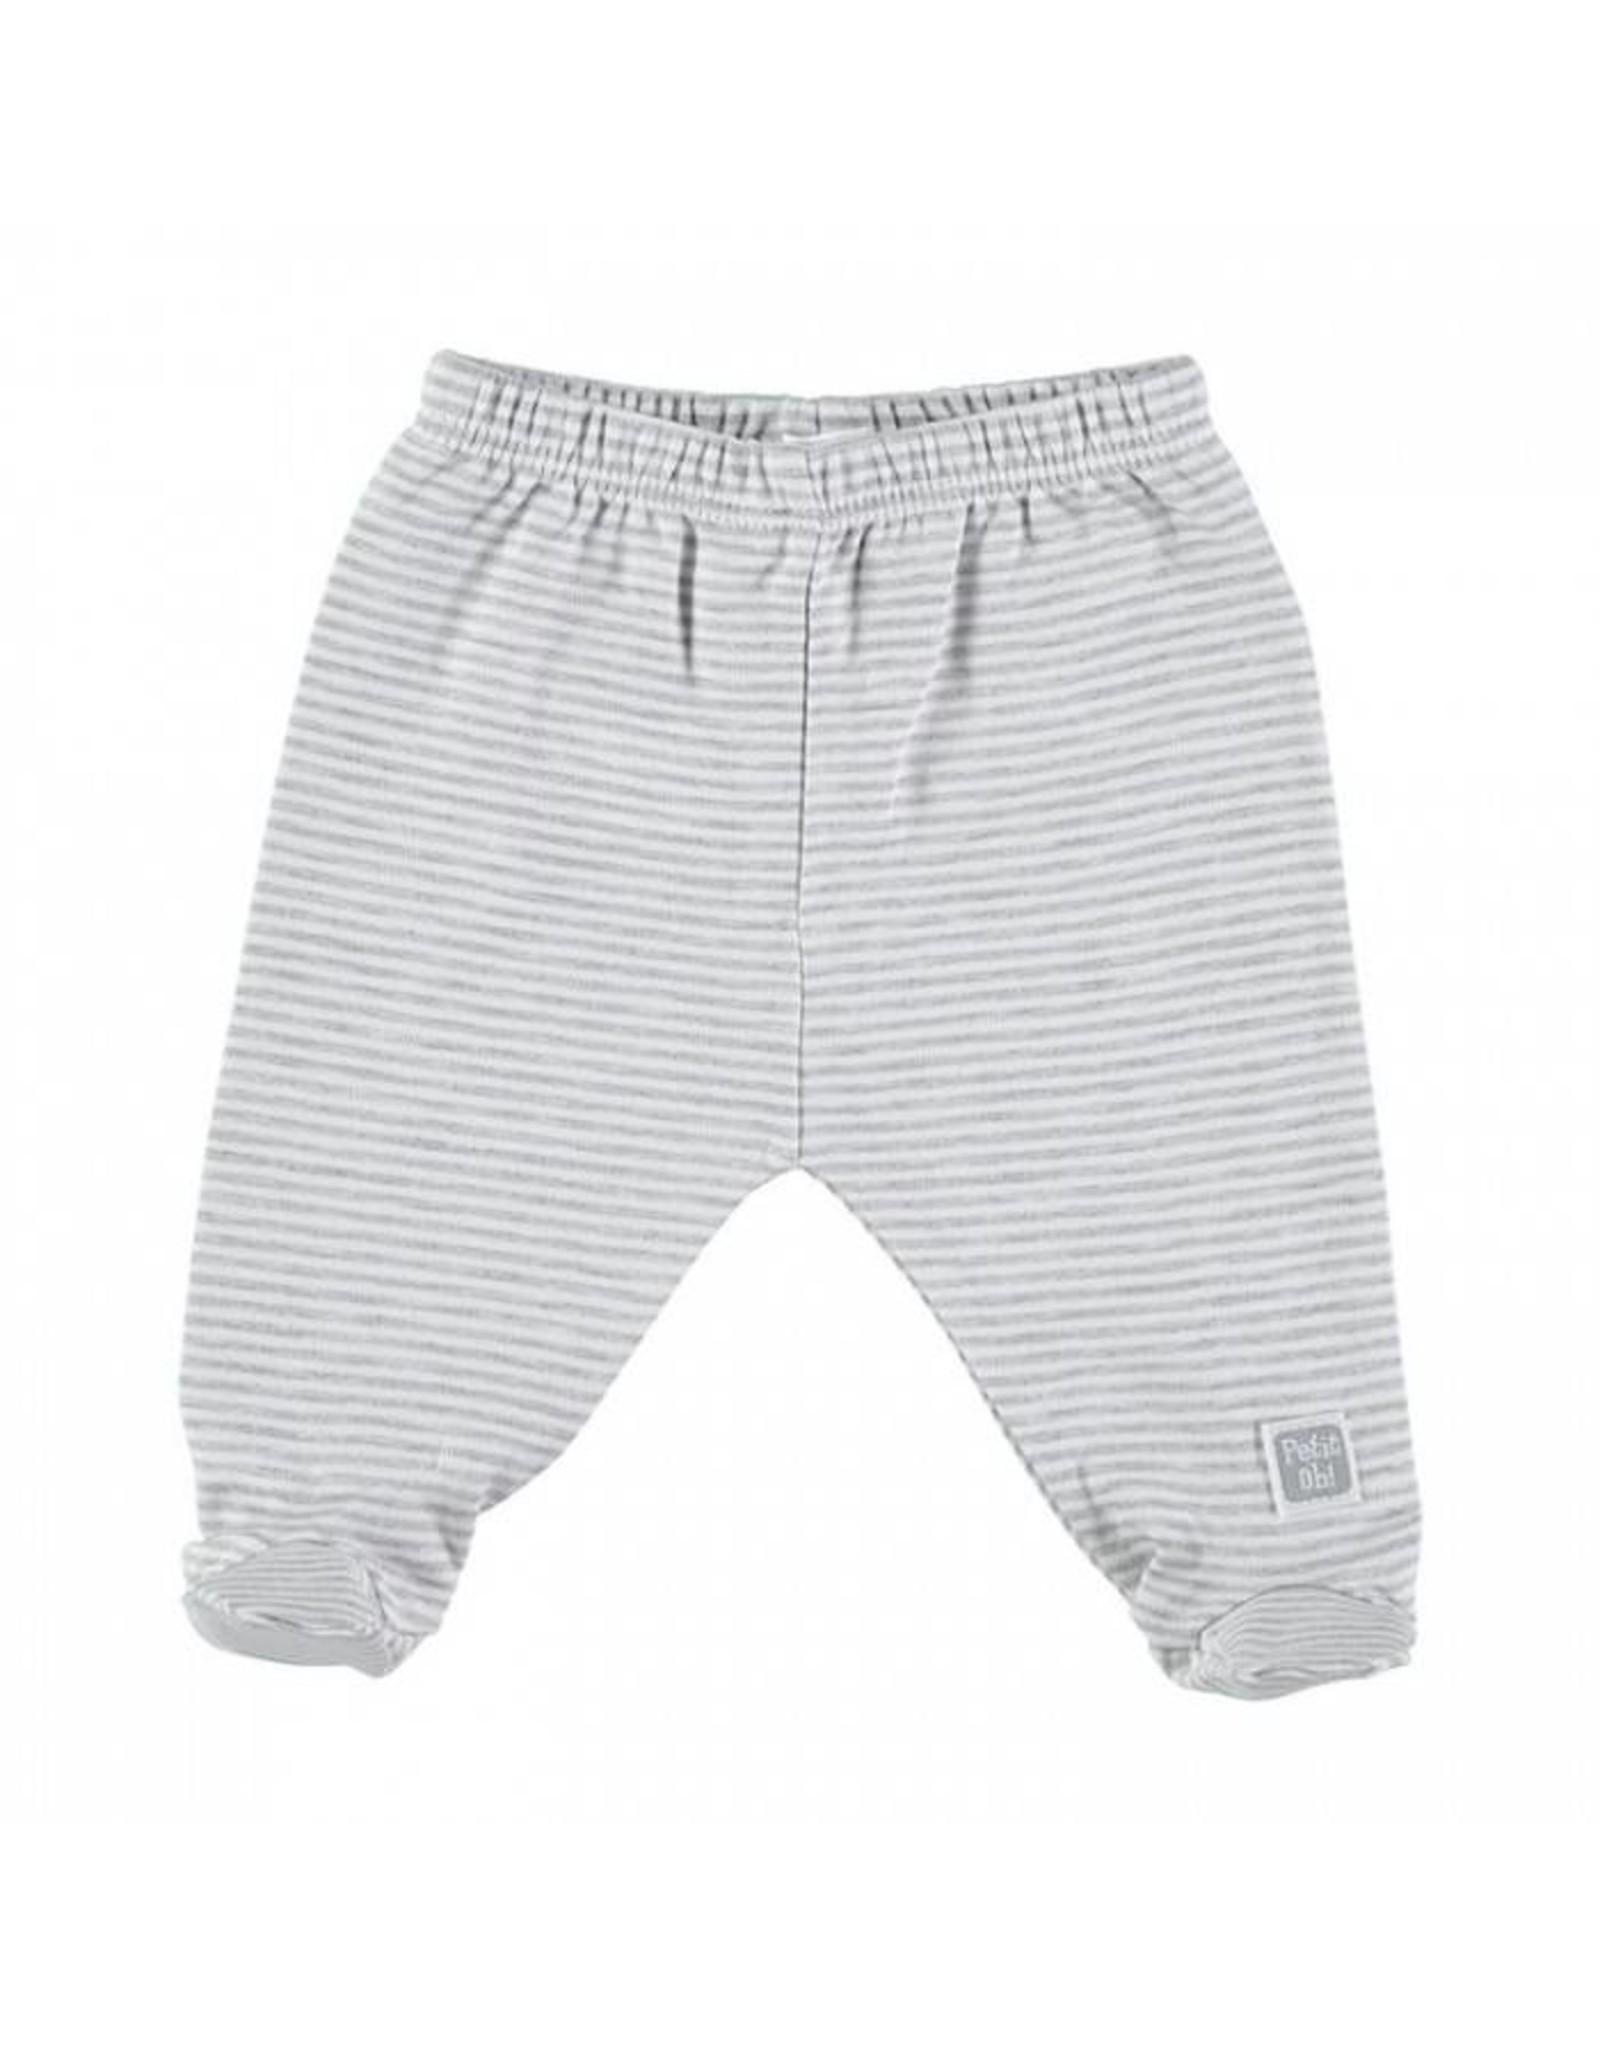 PETIT OH! Grey & White Set